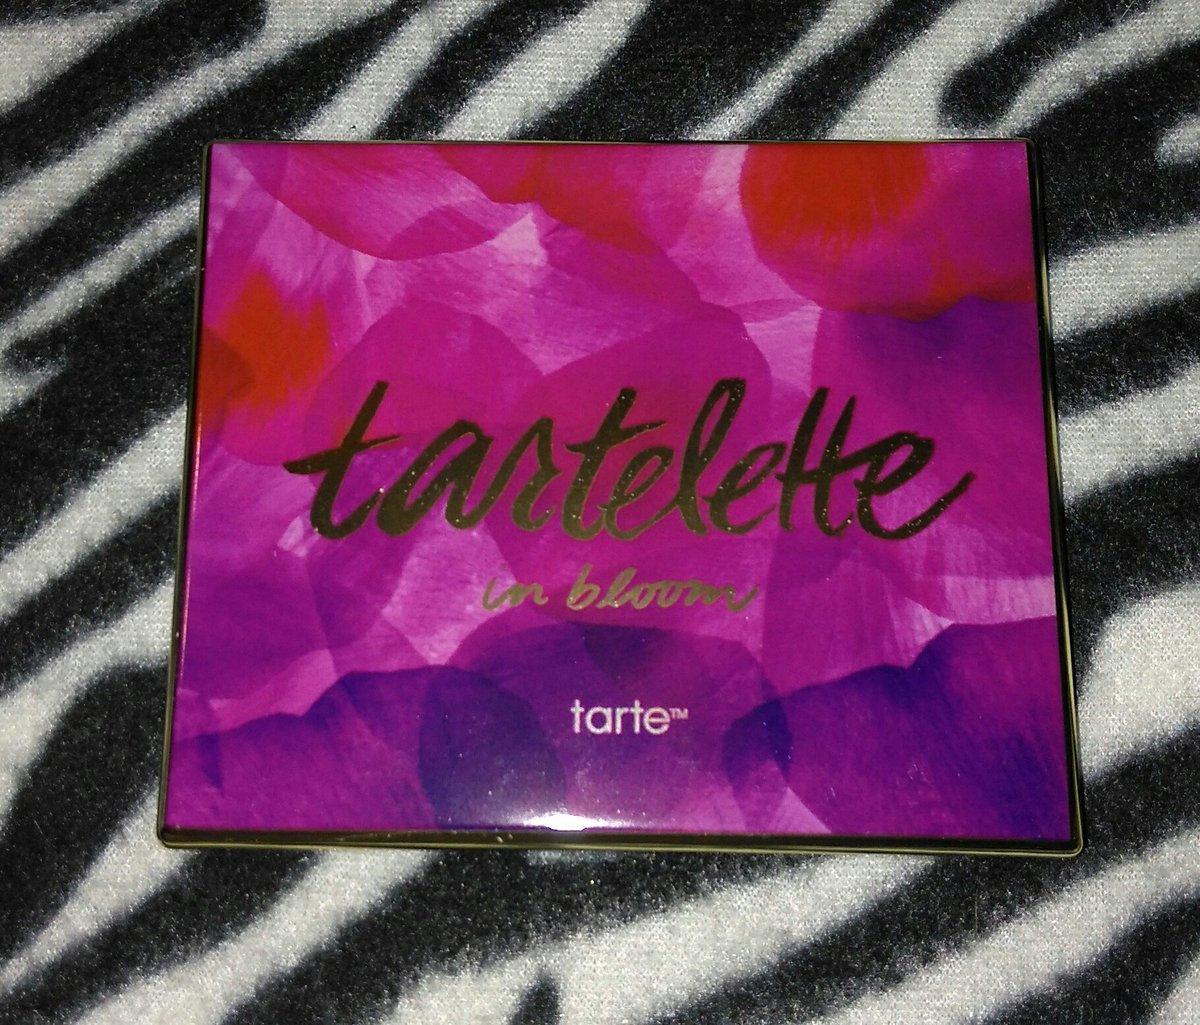 Finally decided to buy the Tarte Tartelette in Bloom Palette! #tarte #eyeshadow #makeup #cosmetics<br>http://pic.twitter.com/lbxmvjyMaE